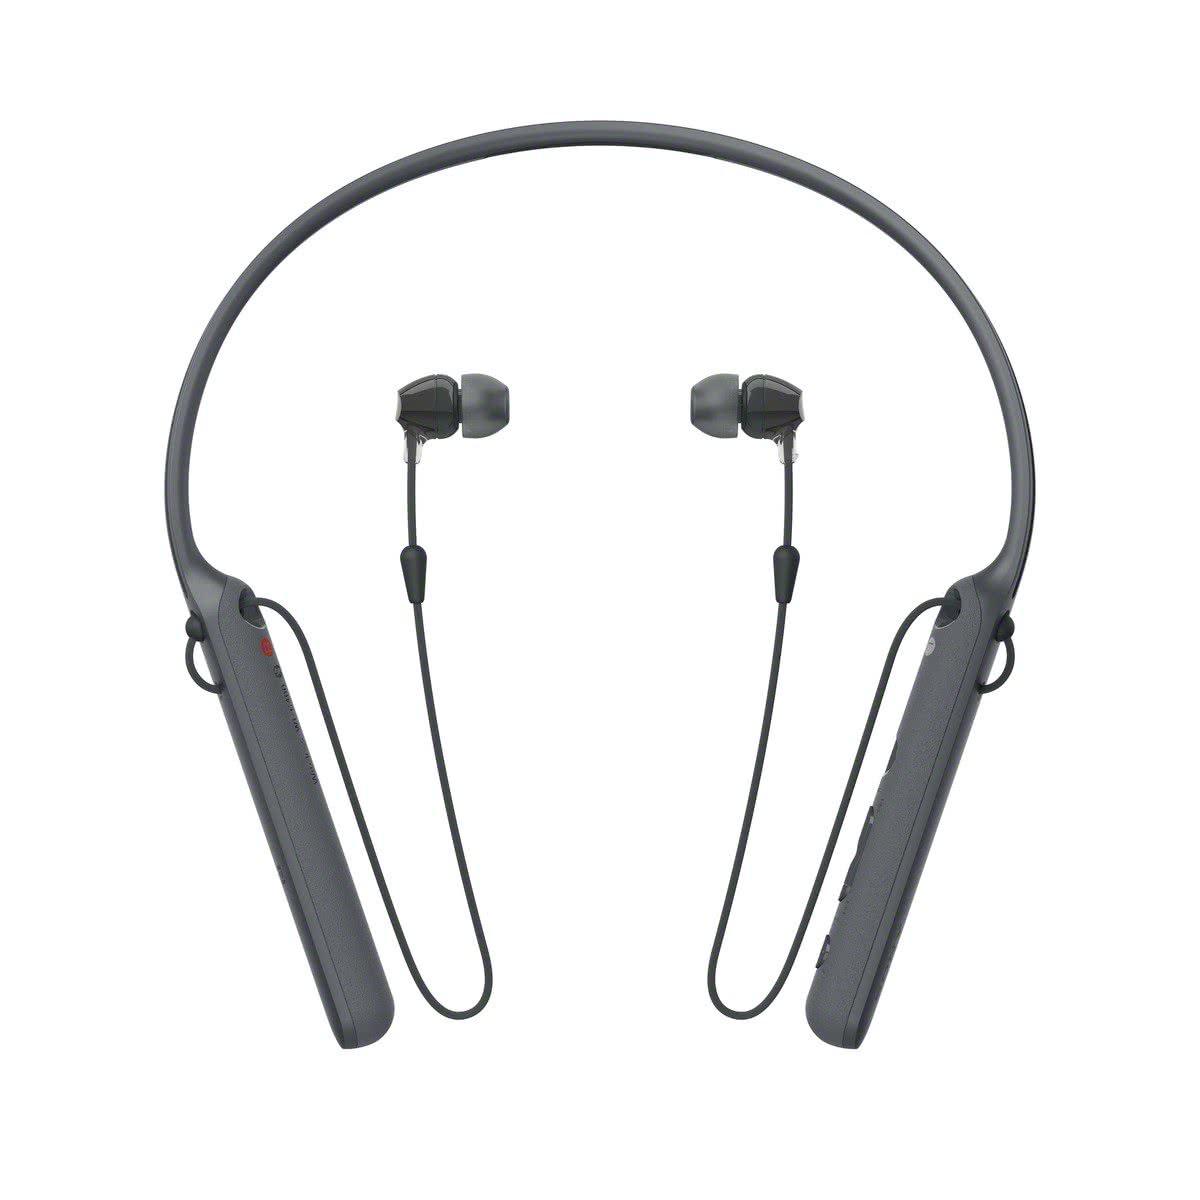 sony wi c400 wireless in ear headphones the walkman blog. Black Bedroom Furniture Sets. Home Design Ideas